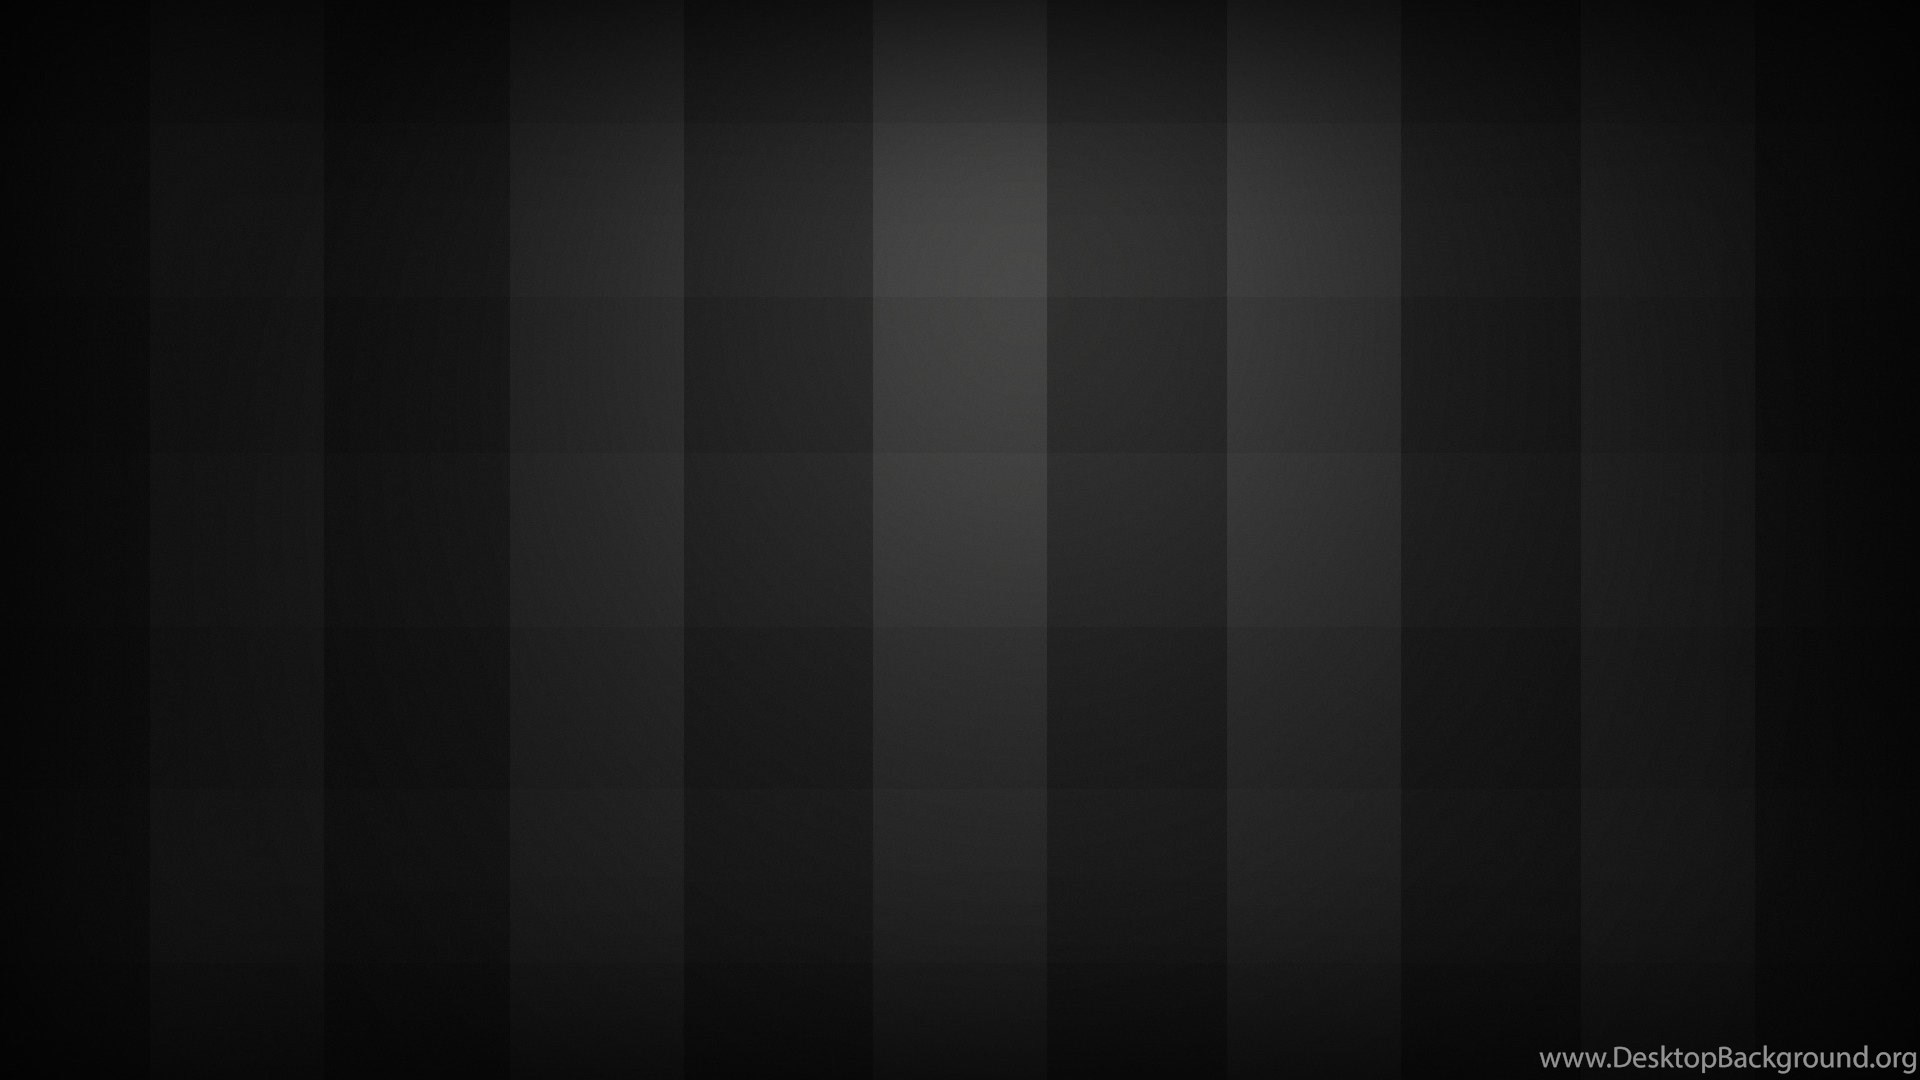 Black Wallpapers High Resolution: High Resolution Black Stripe Desktop Wallpapers HD 13 Full